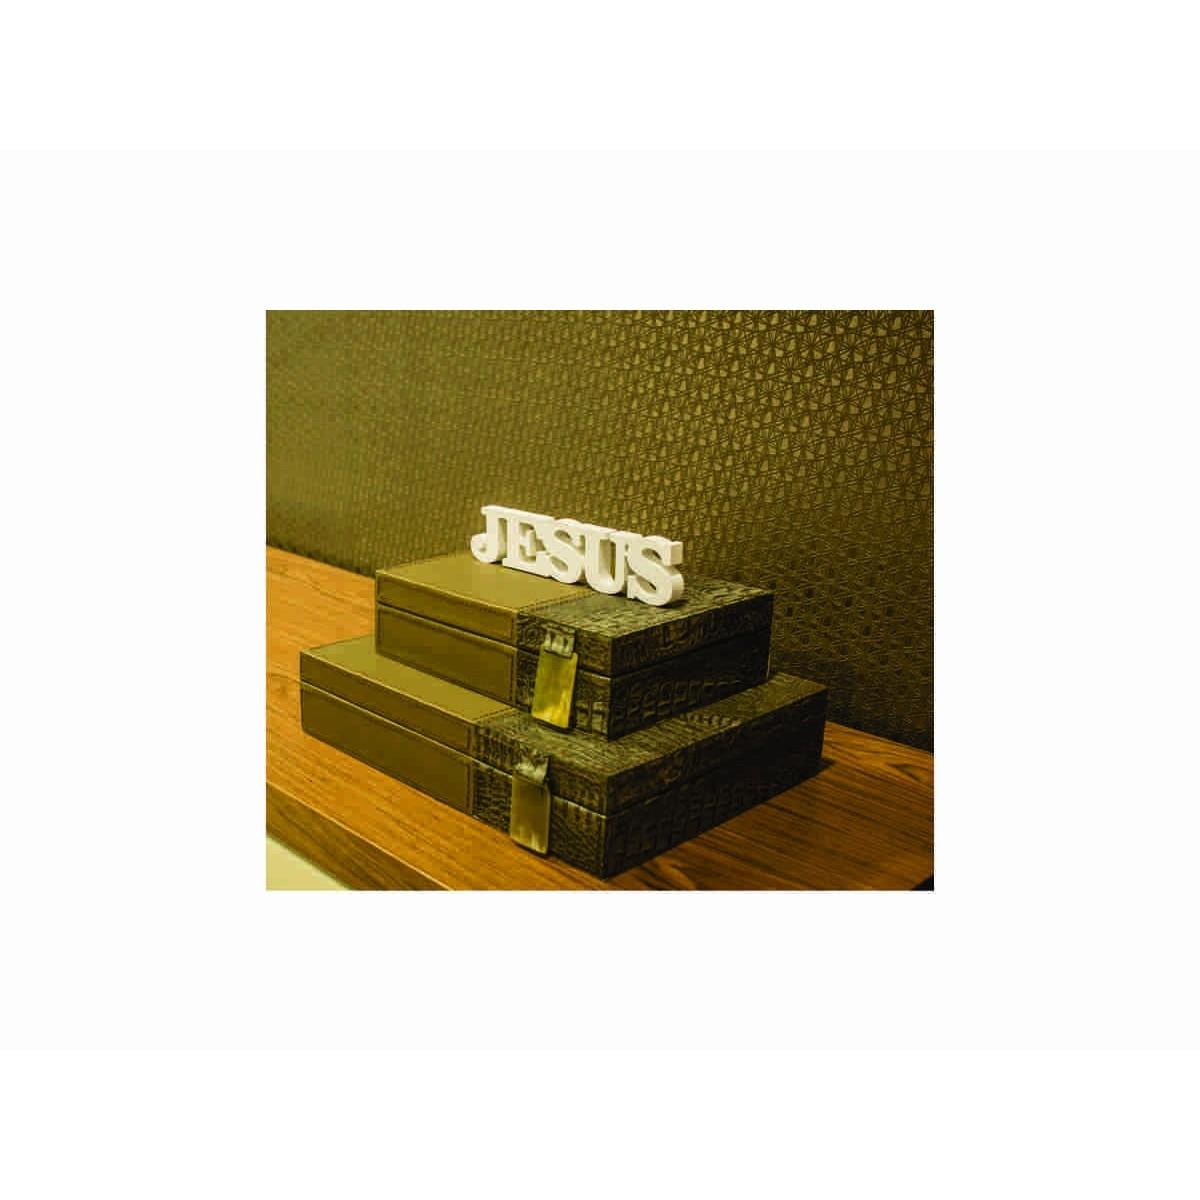 PLACA DE MESA DECORATIVA - JESUS - 40x10cm